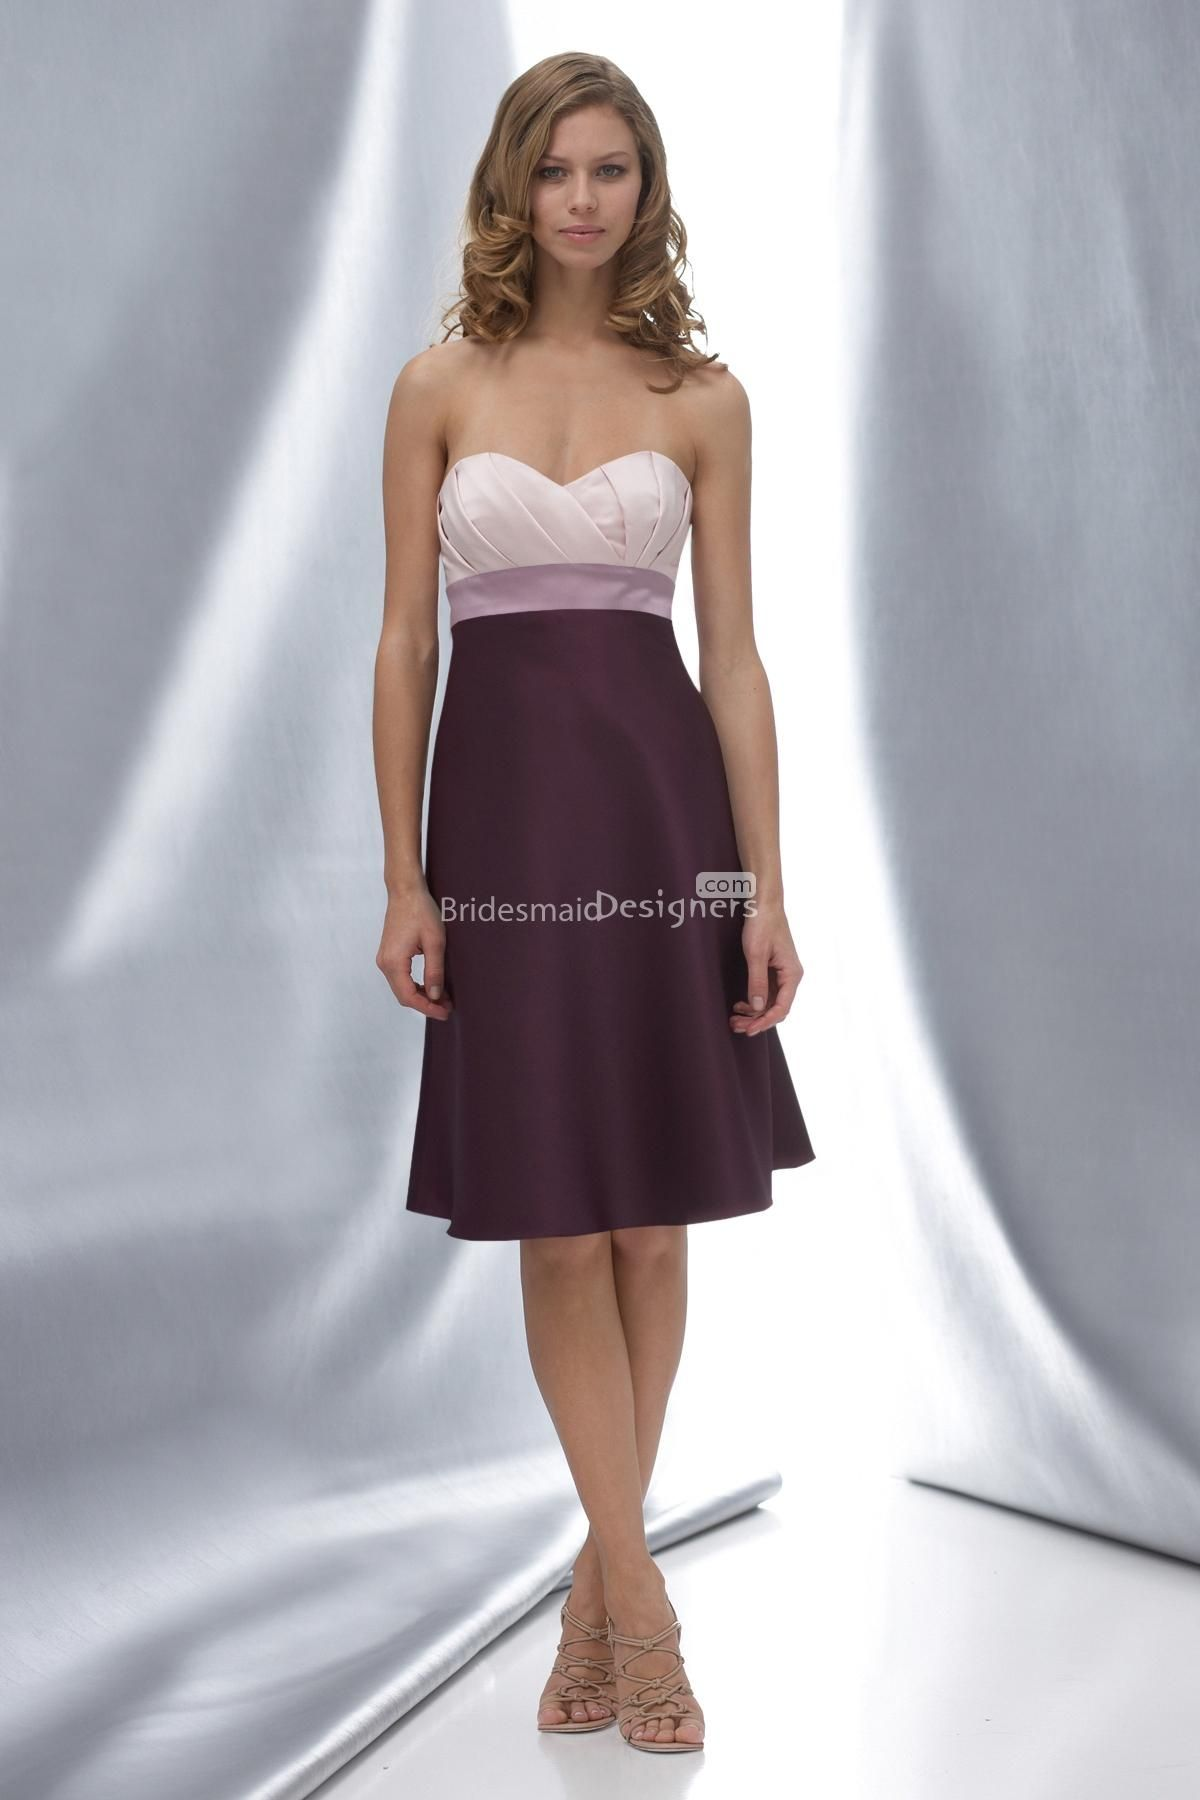 17  images about Bridesmaid Dresses on Pinterest - Asymmetrical ...